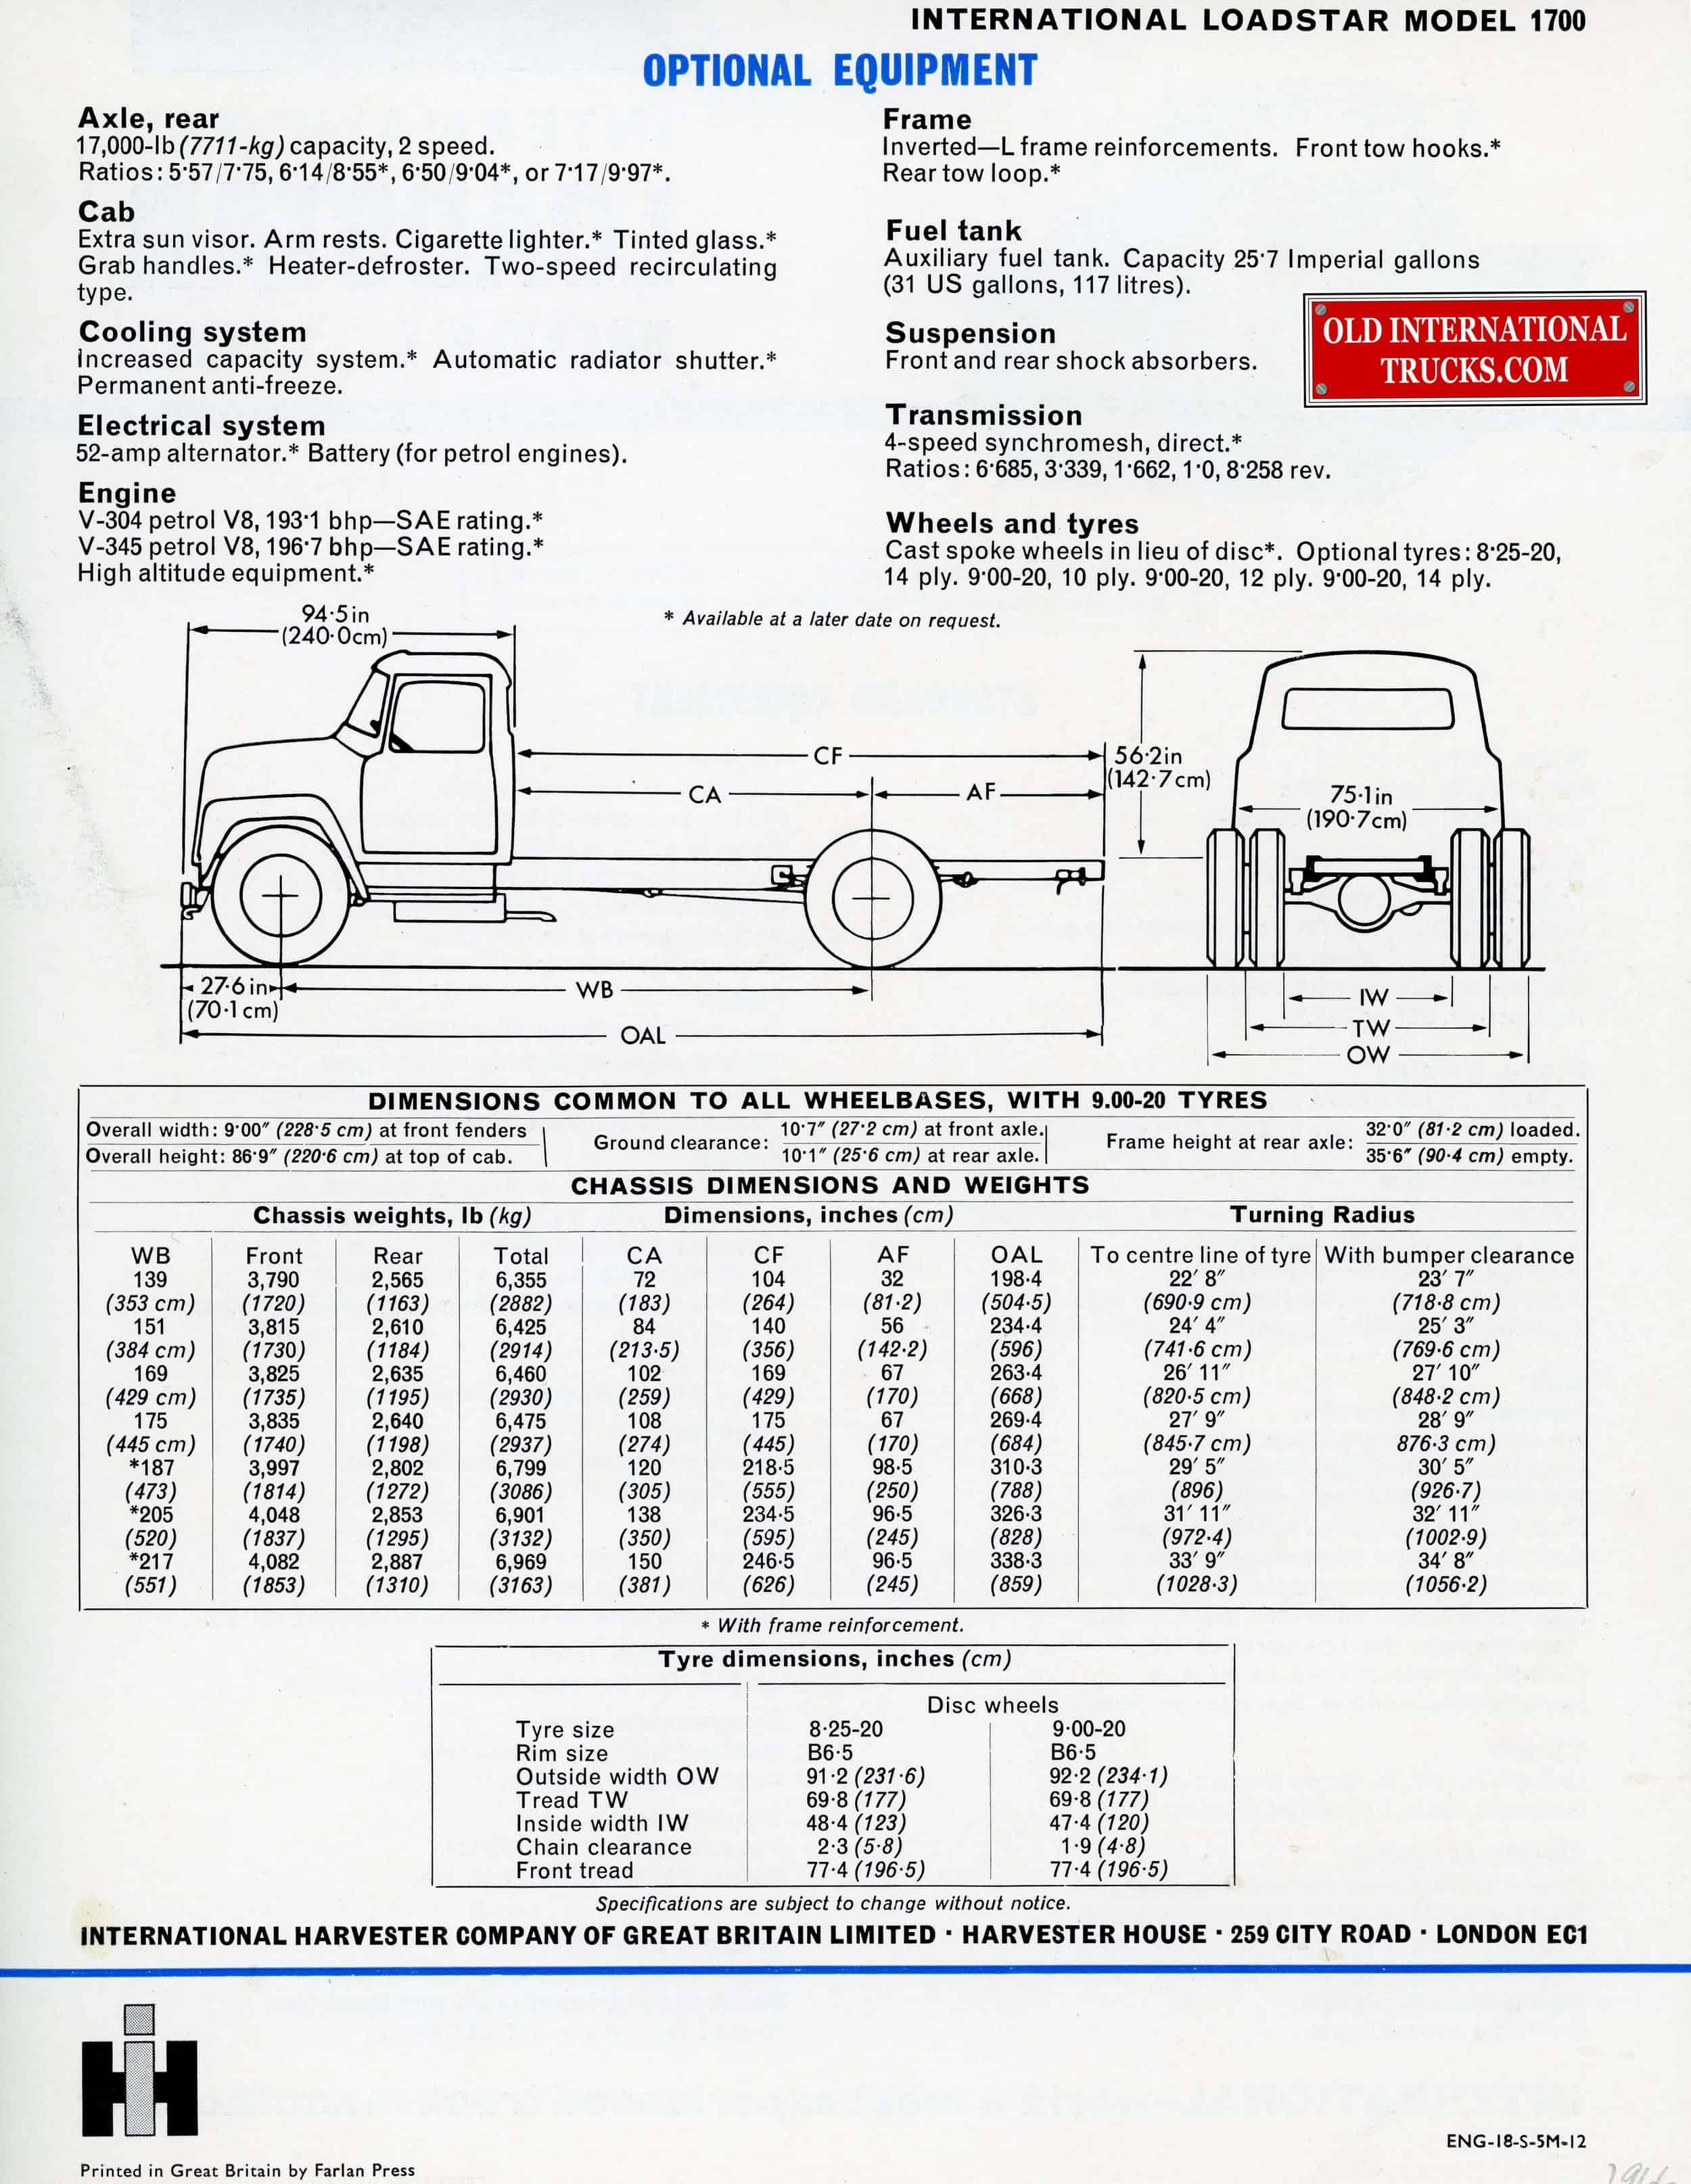 enchanting 1974 ih loadstar 1700 wiring diagram photos